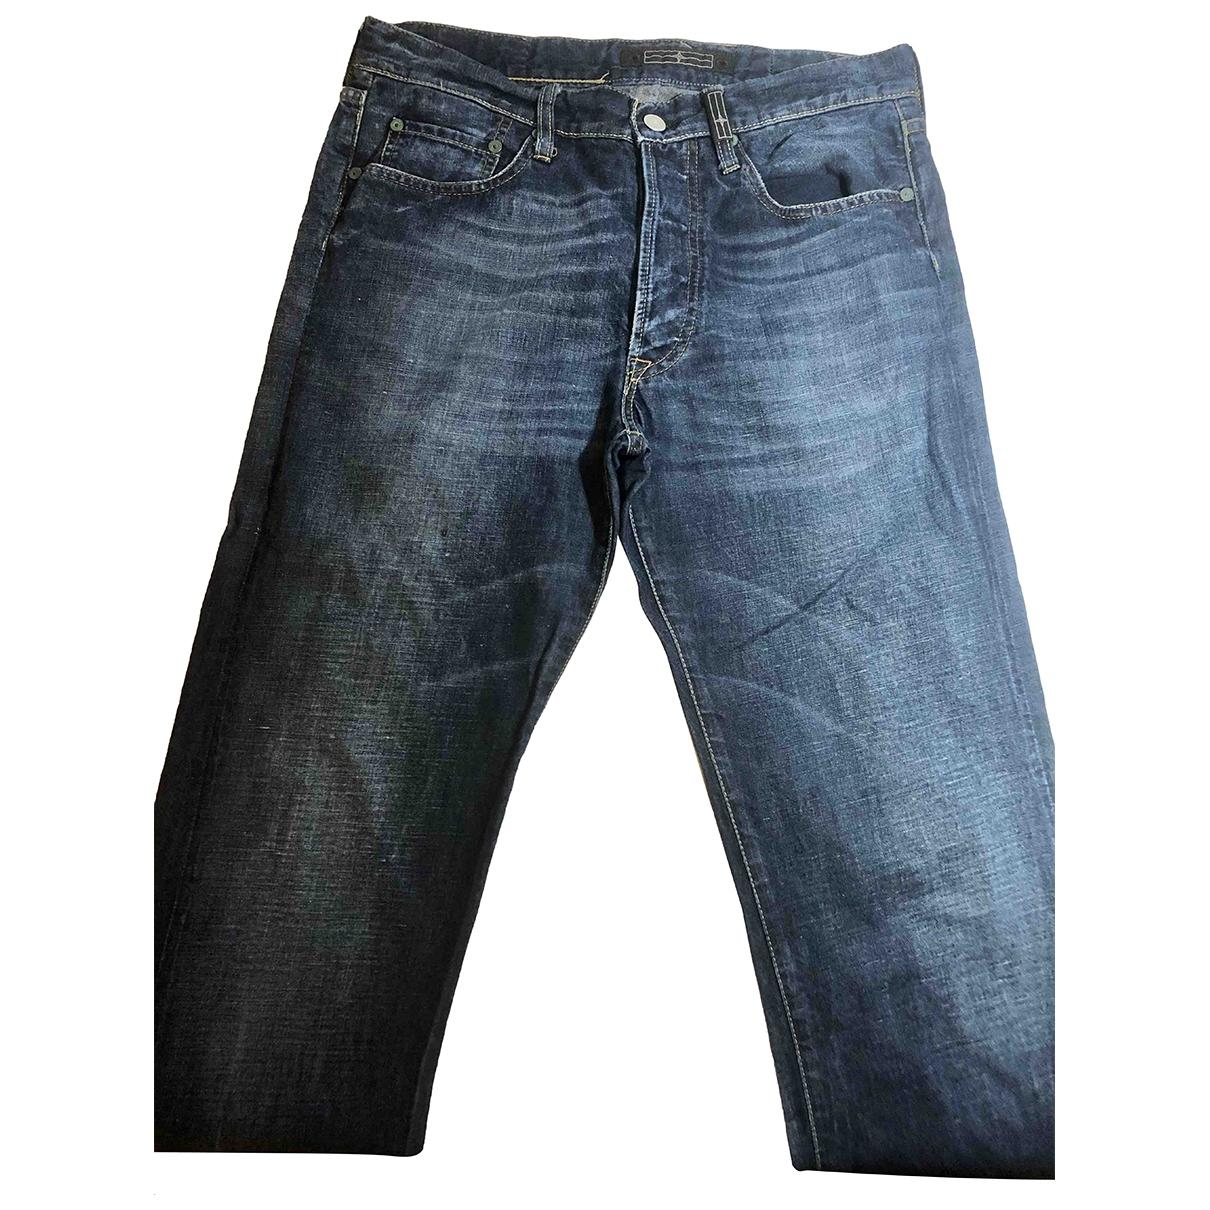 Stone Island \N Blue Cotton - elasthane Jeans for Men 32 US